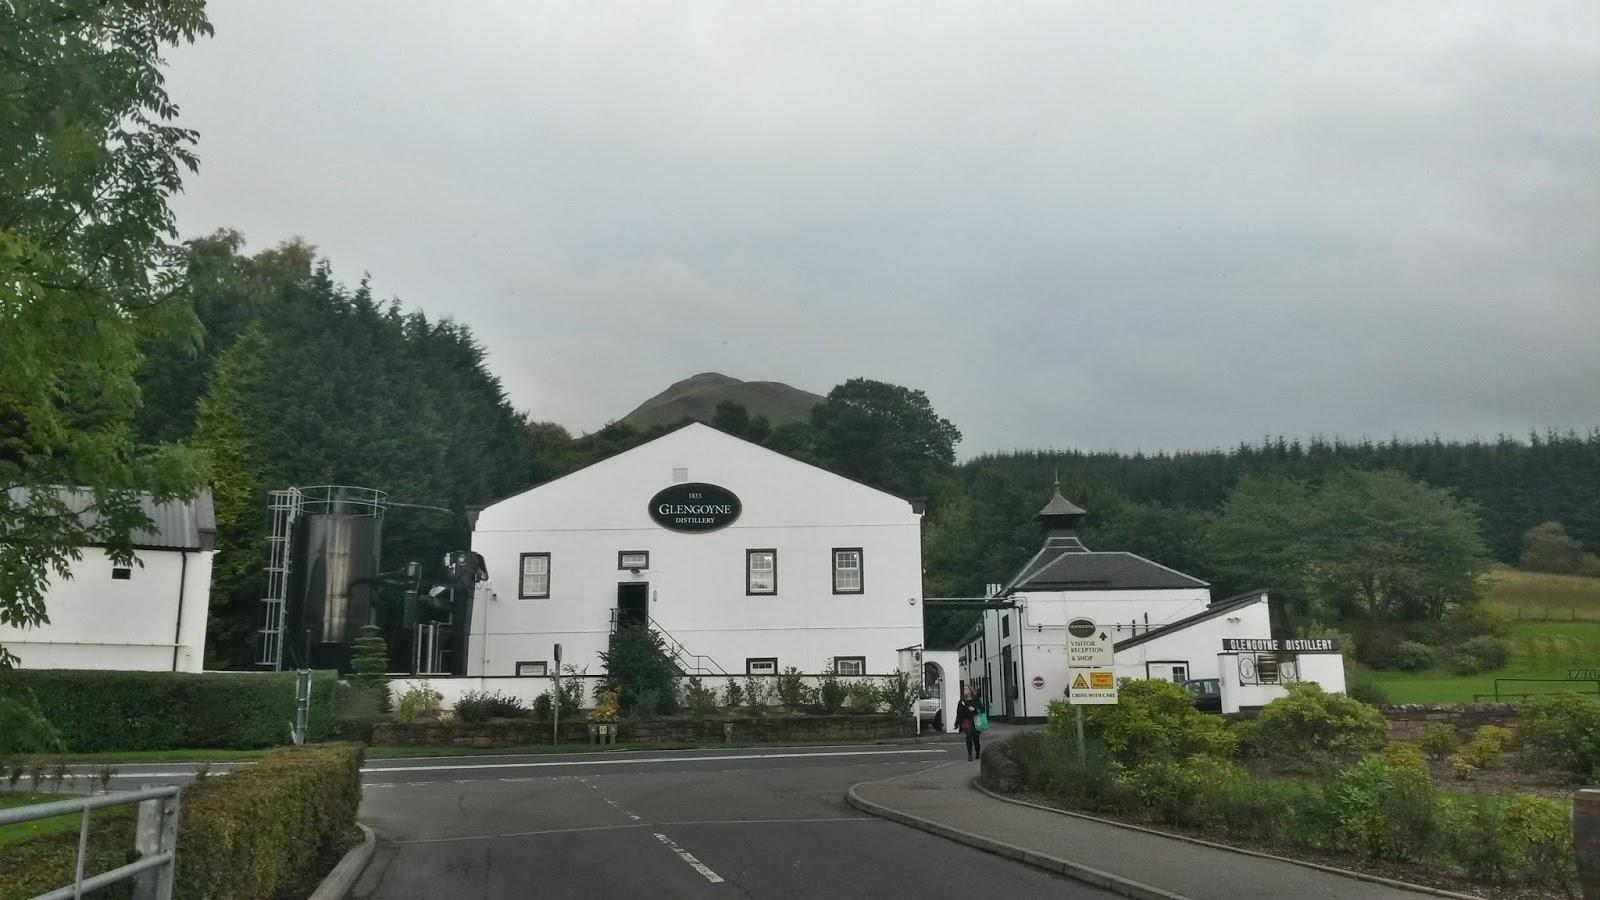 edinburgh scotland iskoçya whisky tour glengoyne britanya